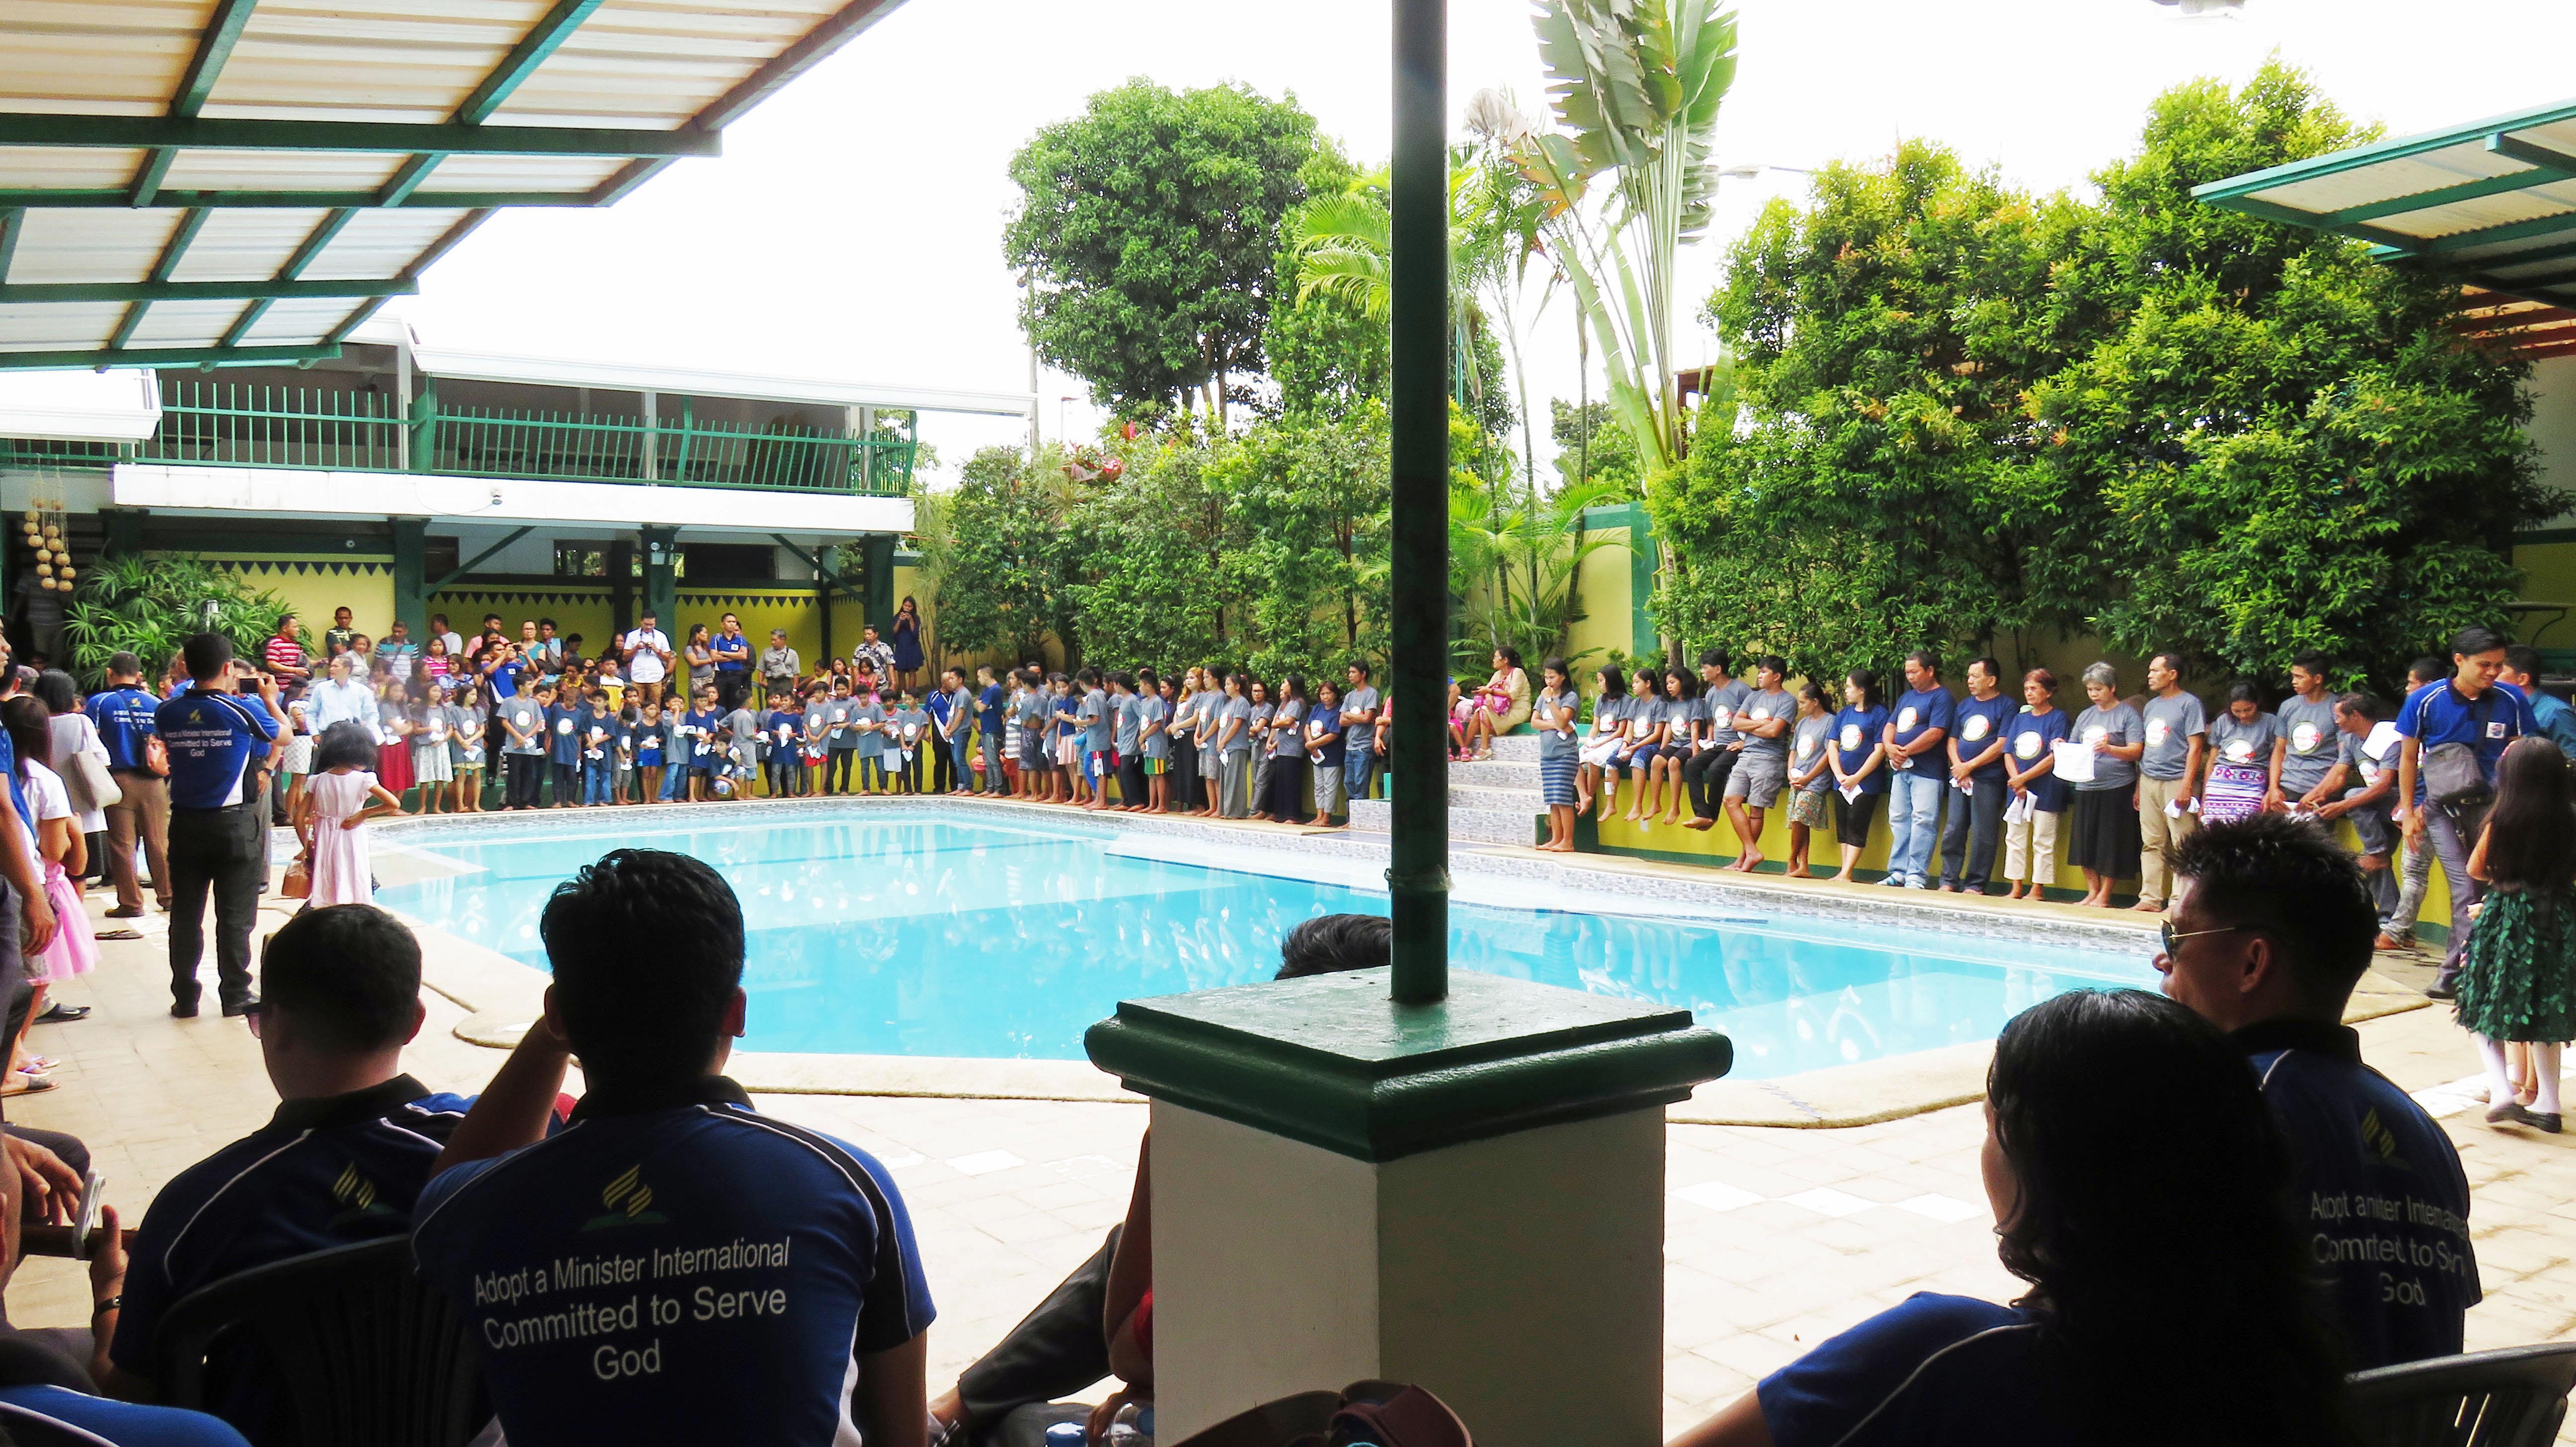 51,000 Precious Souls were Baptized in 2018 in Mindanao (Philippines)